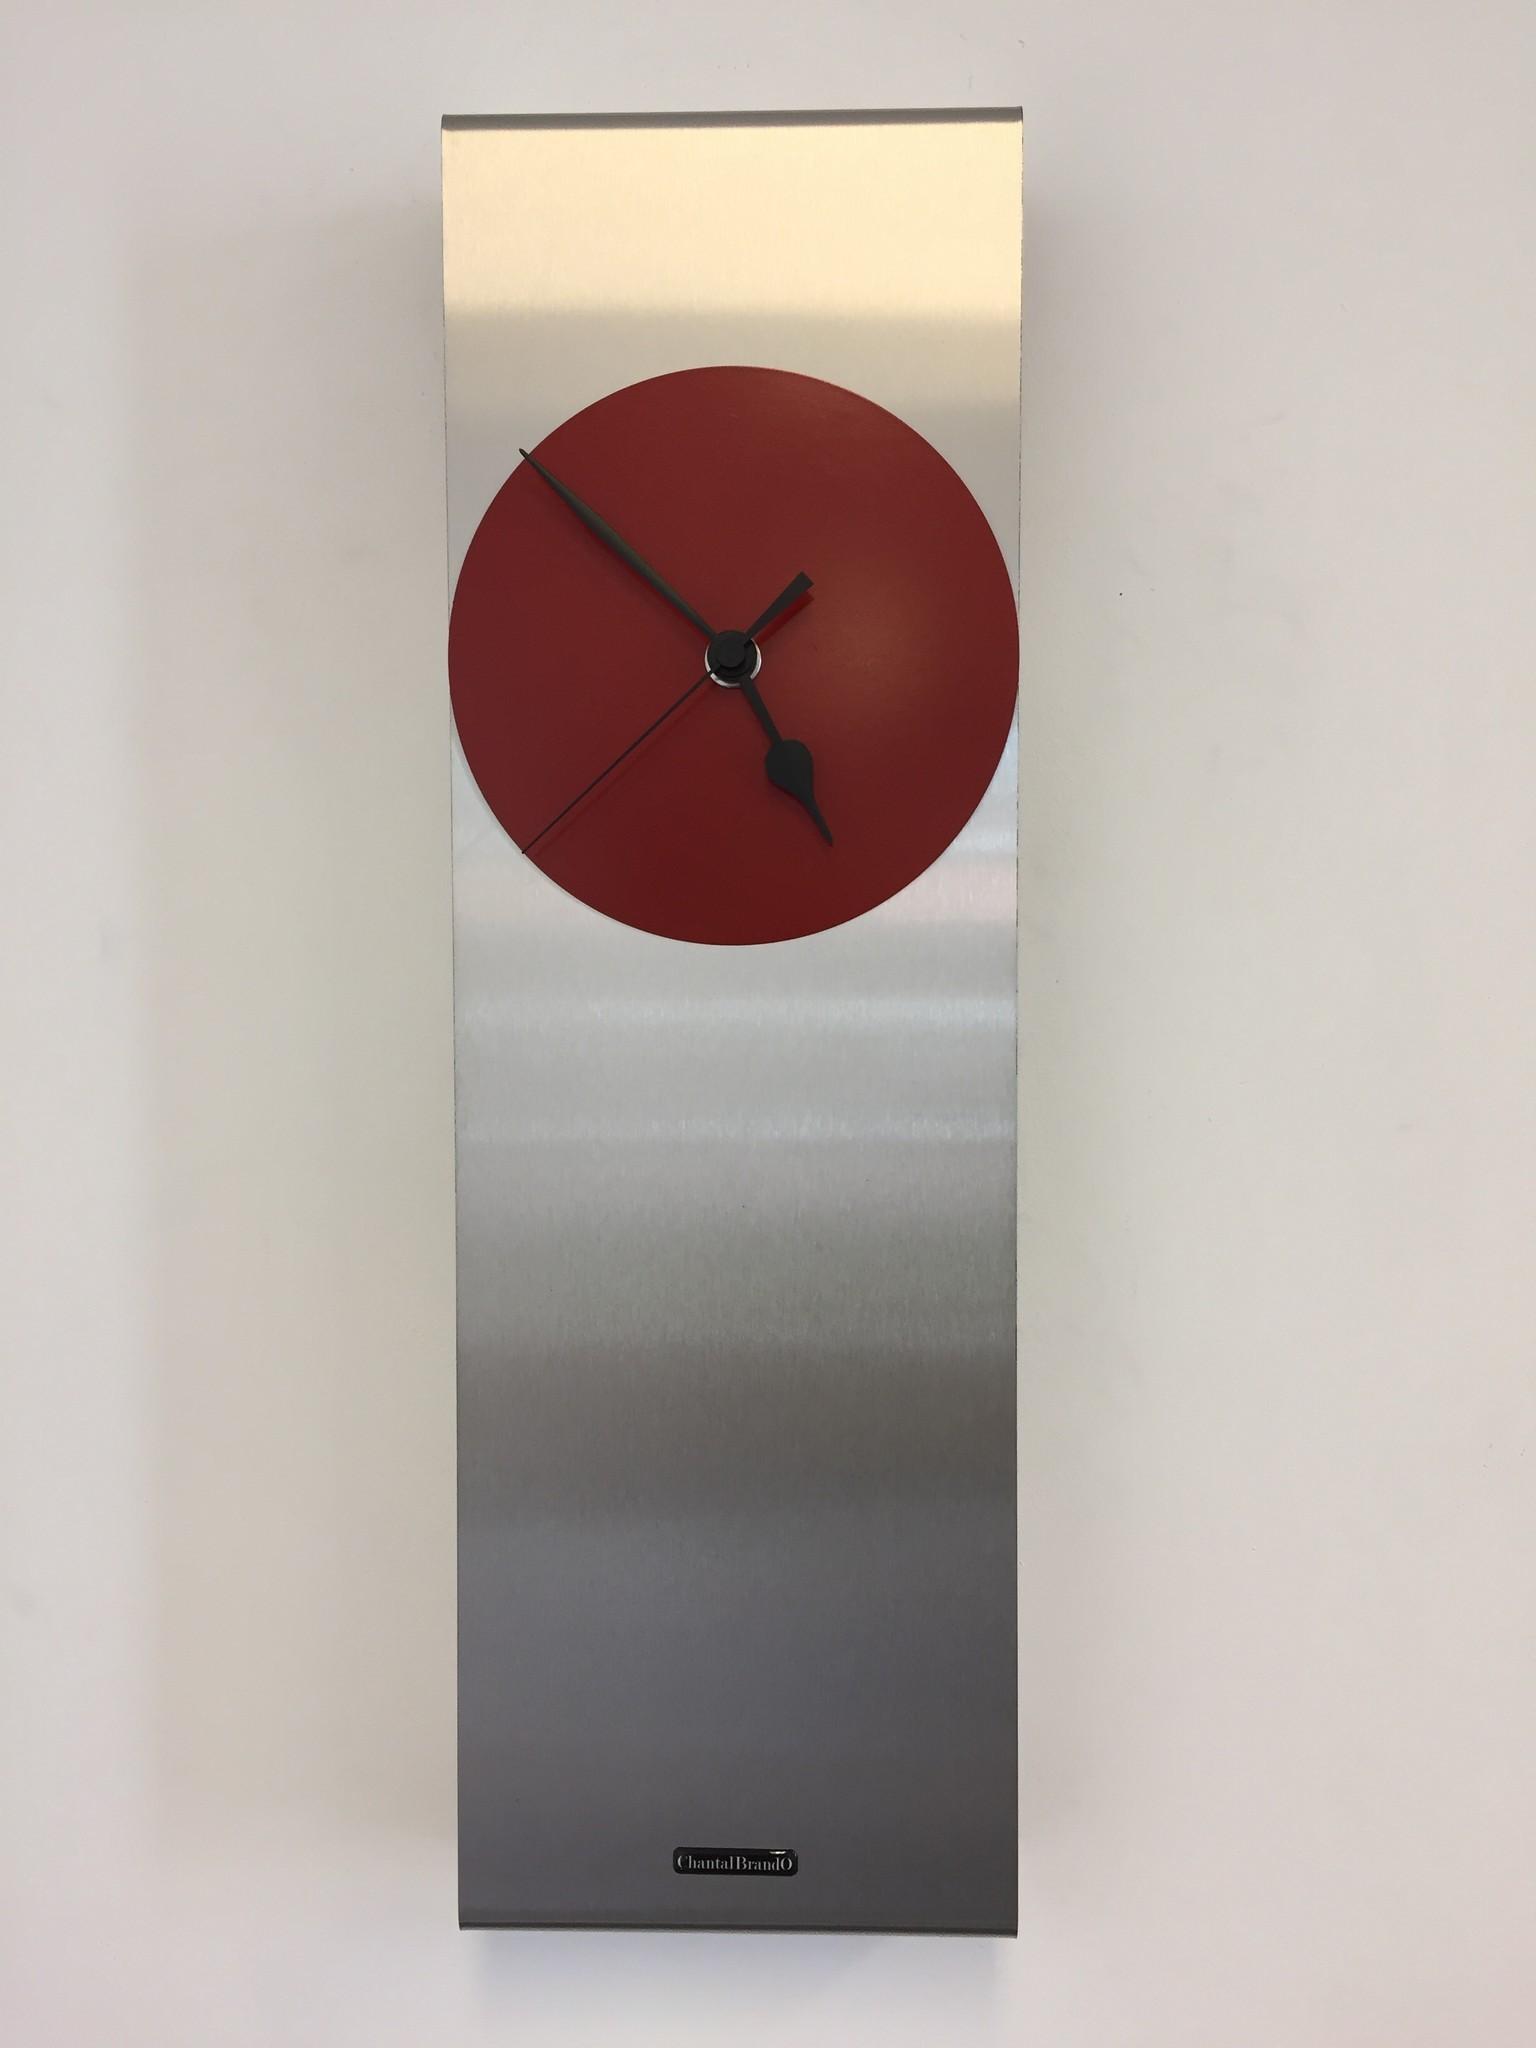 ChantalBrandO Wandklok Manhattan RED & BLACK Modern Dutch Design